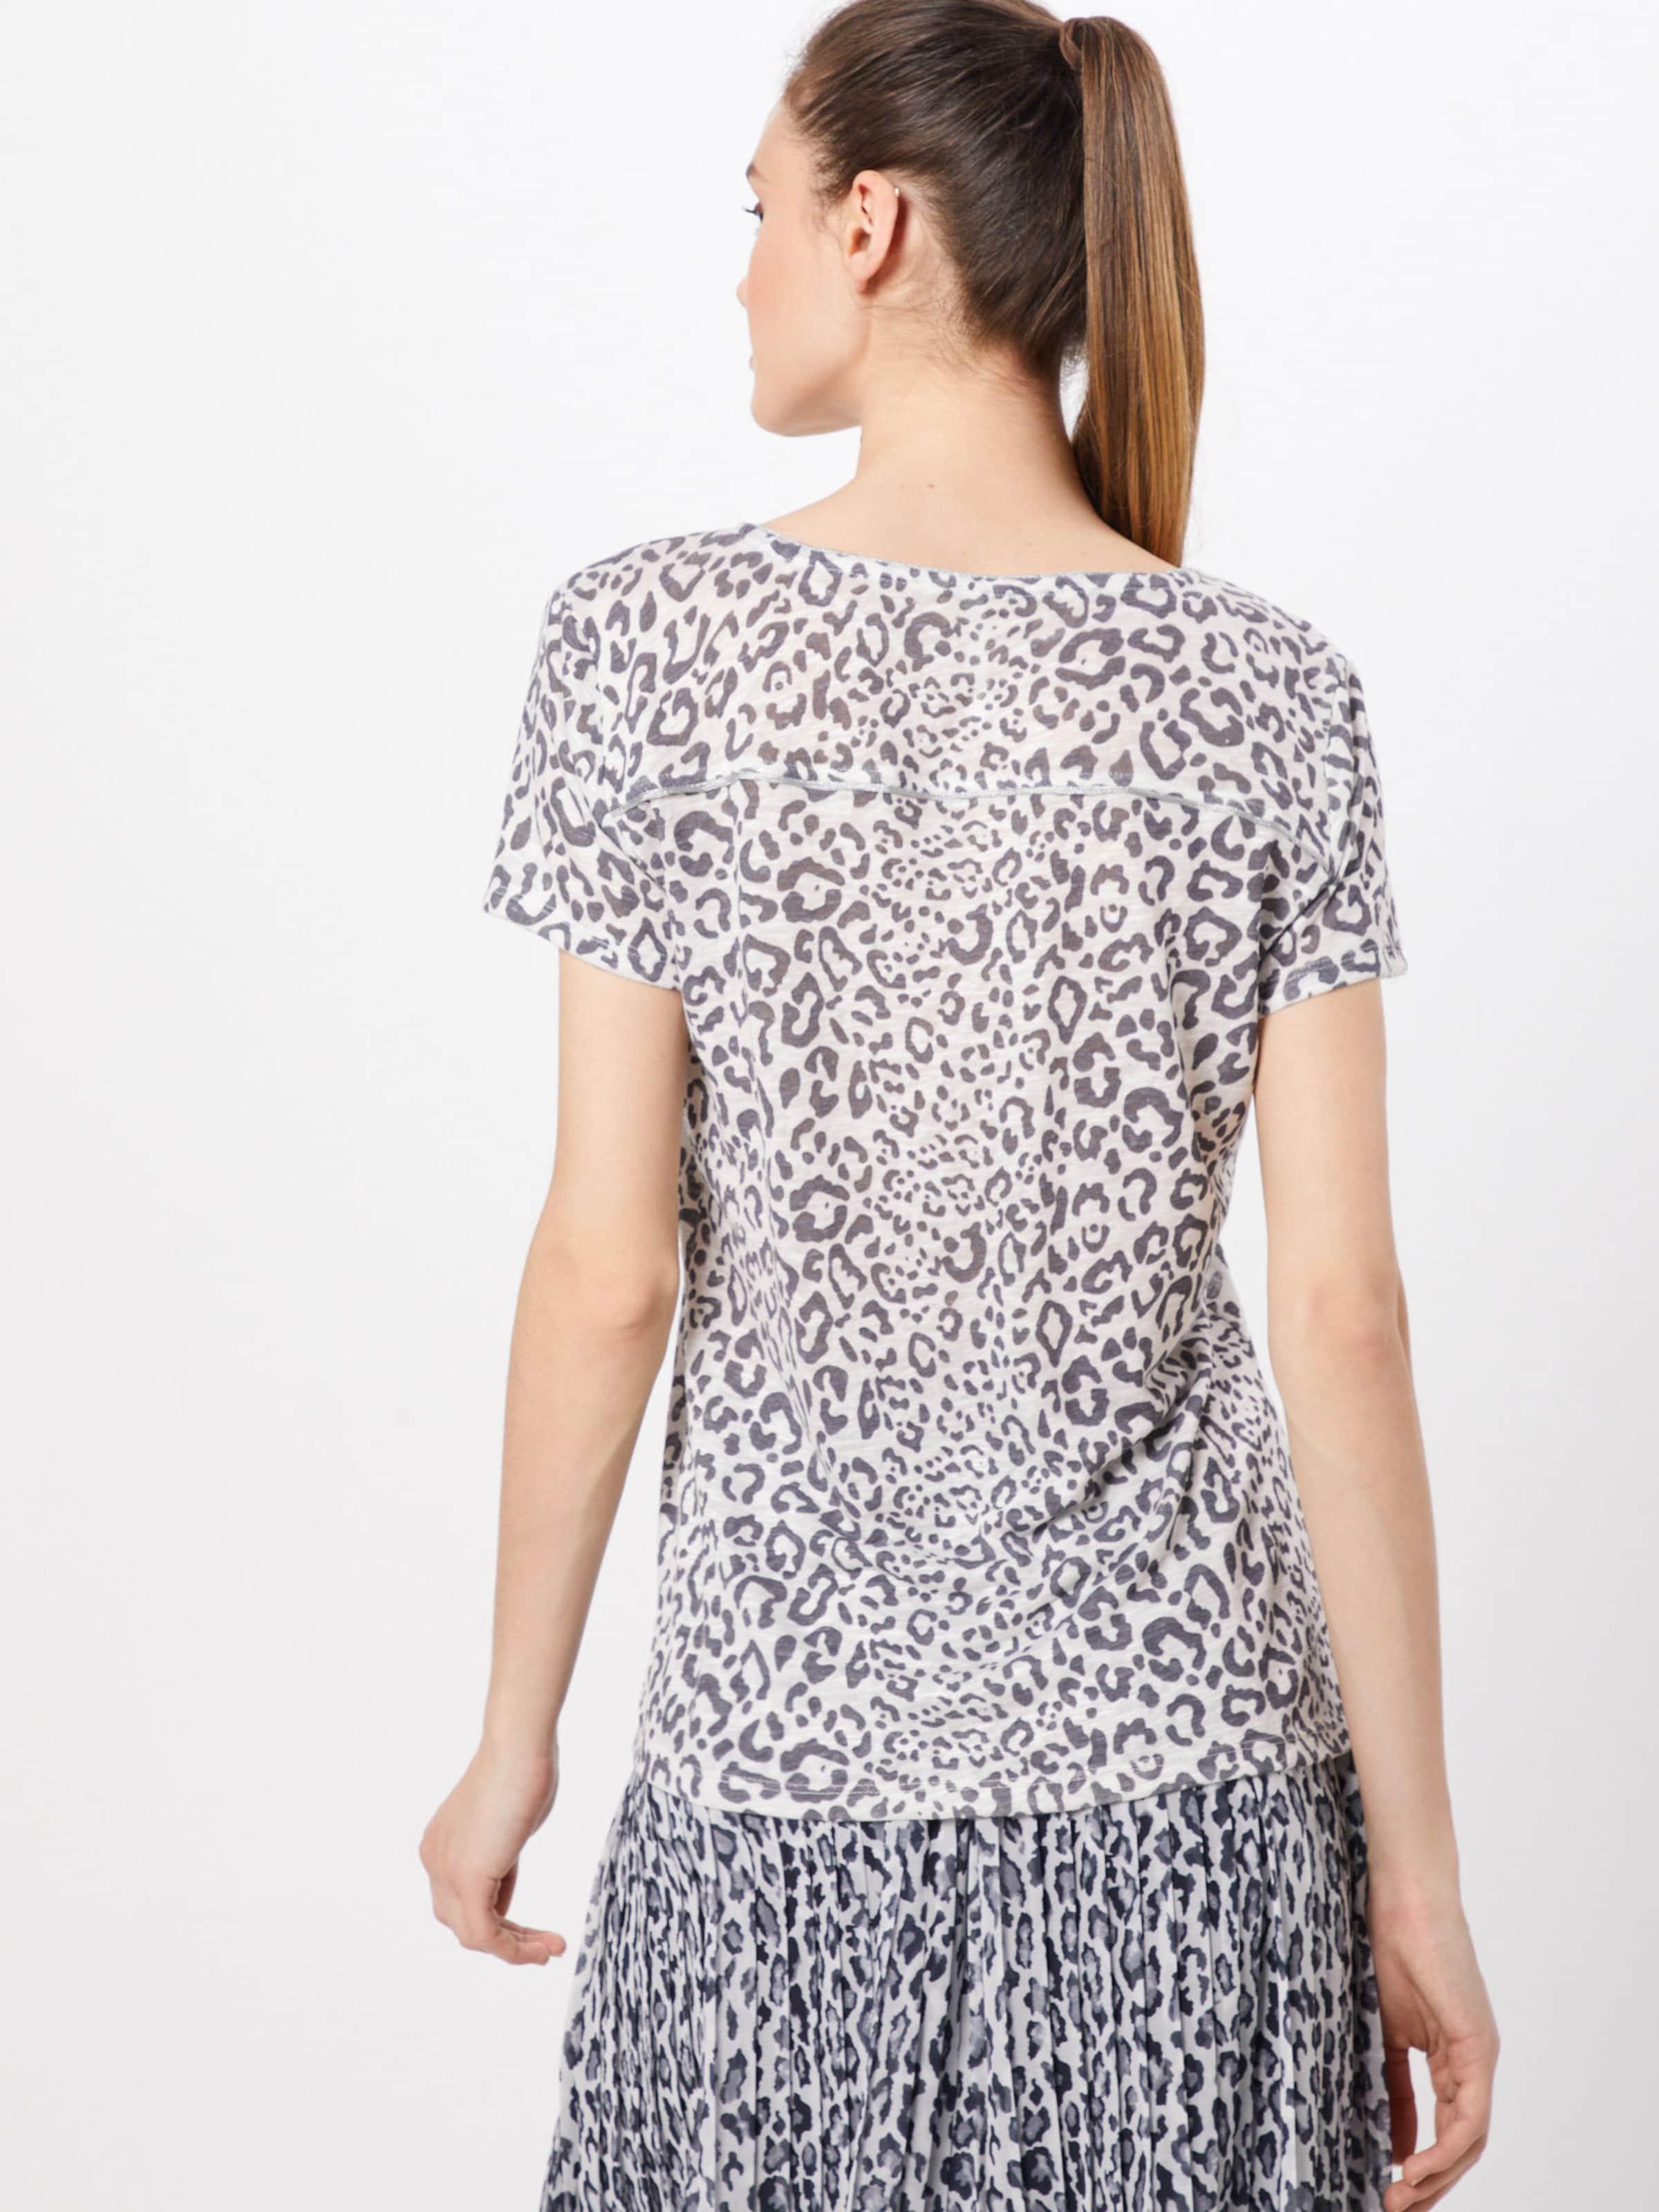 GrisBlanc T shirt Key Largo 'true' En QrdhtCxs